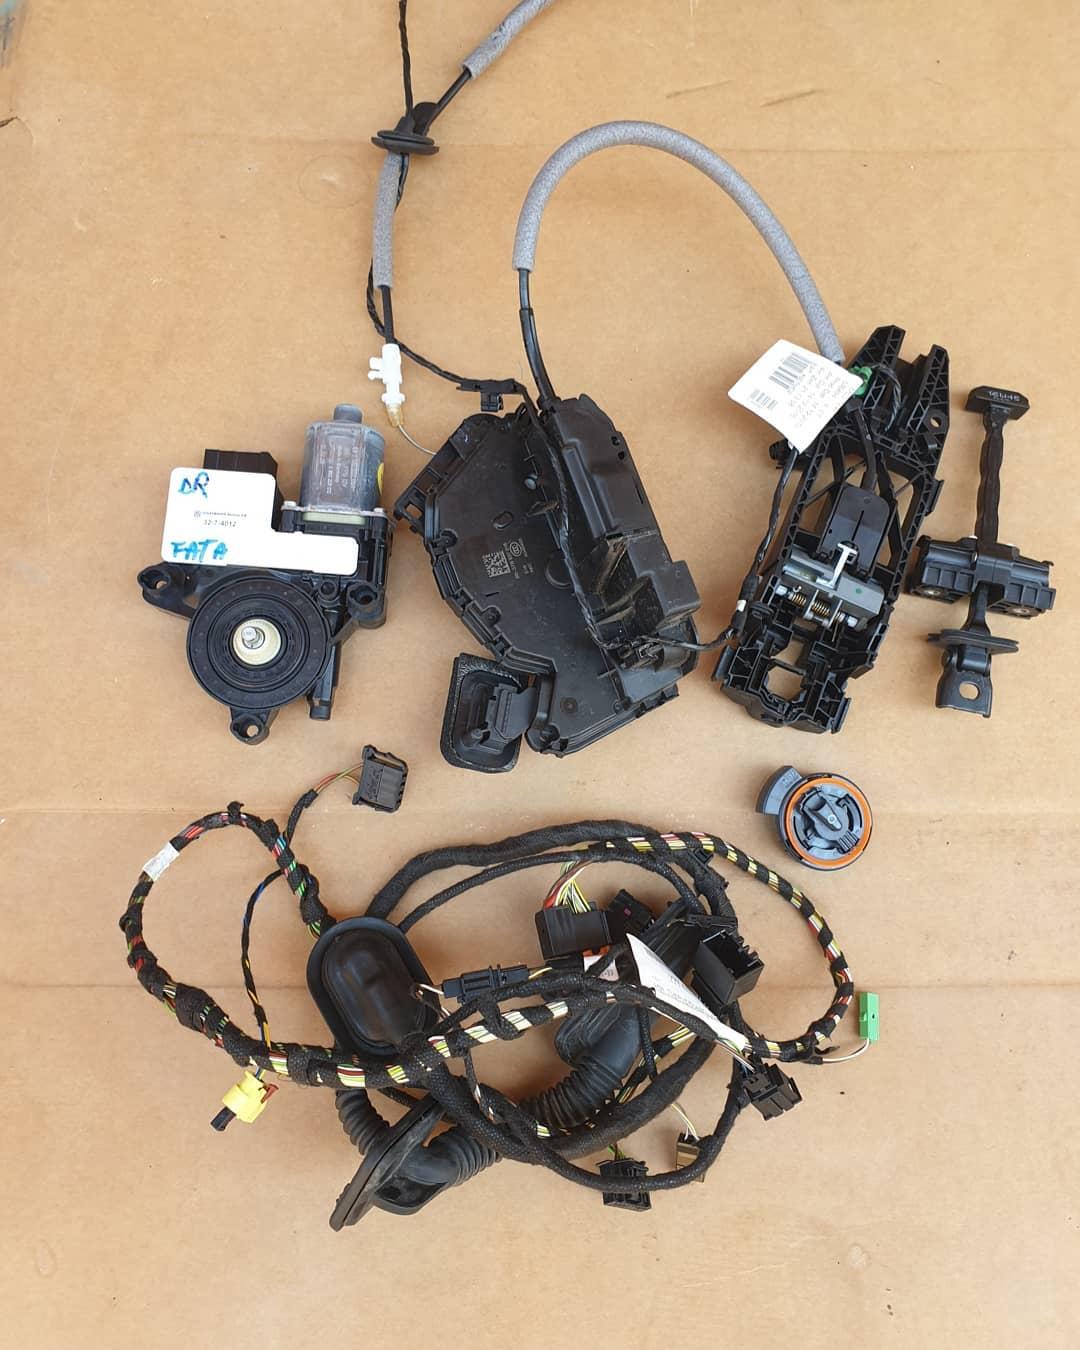 VW Polo Vl Broasca, incuietoare, senzor implact, motoras geam, macara geam, balama, instalatie